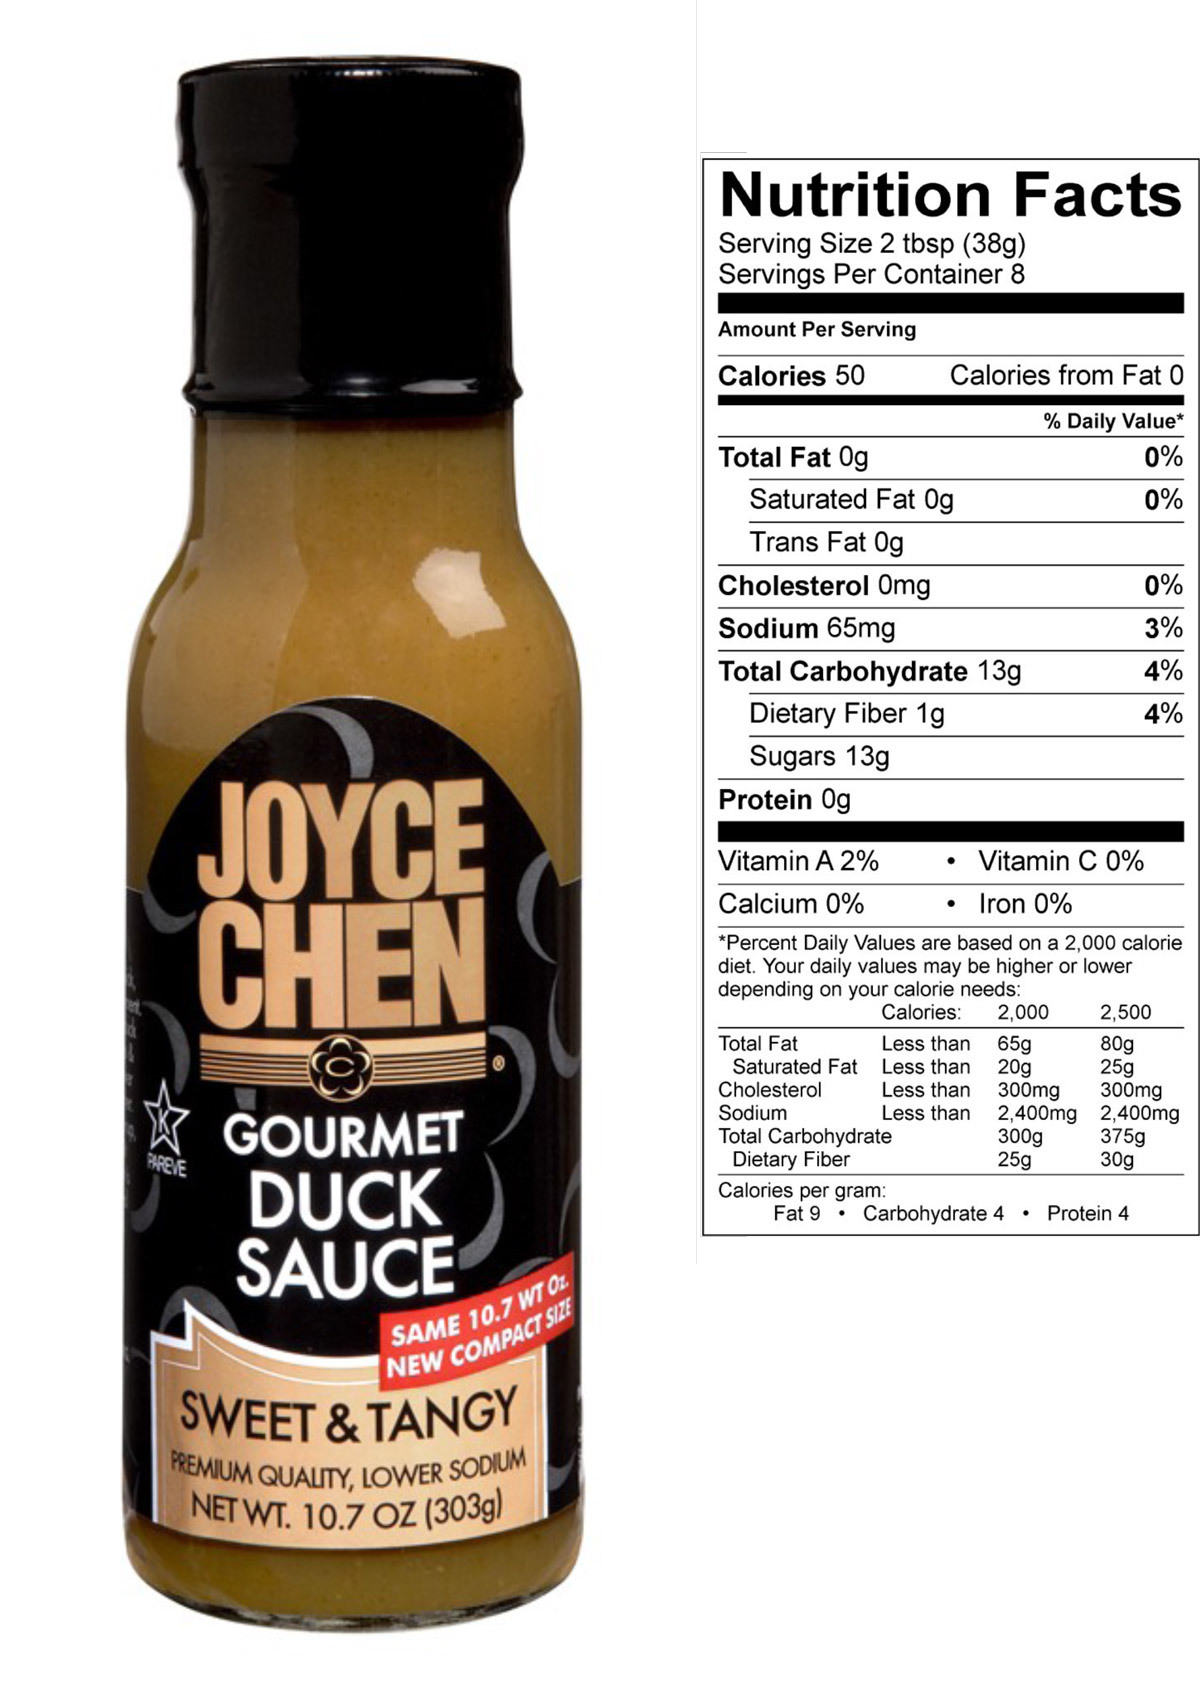 Joyce Chen Premium Gourmet Duck Sauce